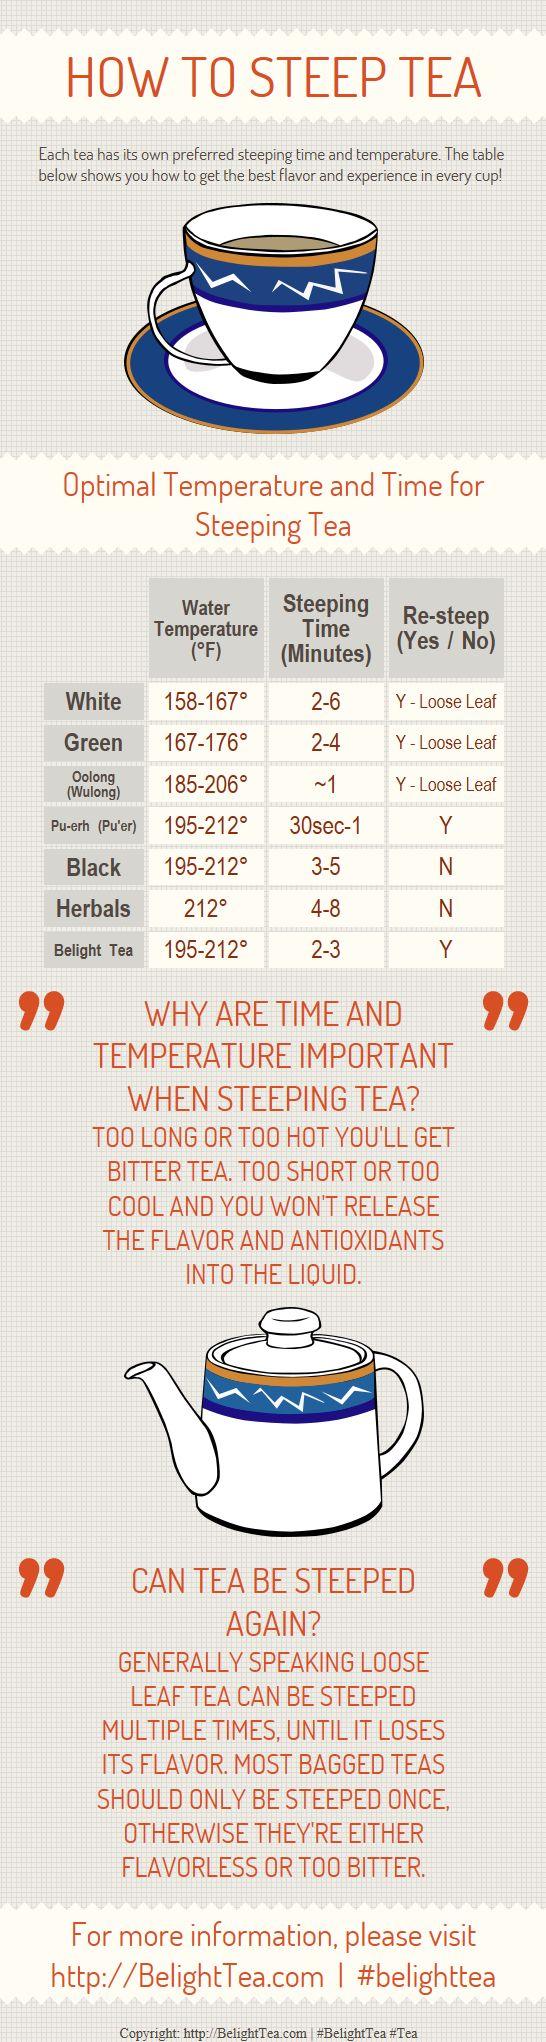 How to Steep Tea Infographic